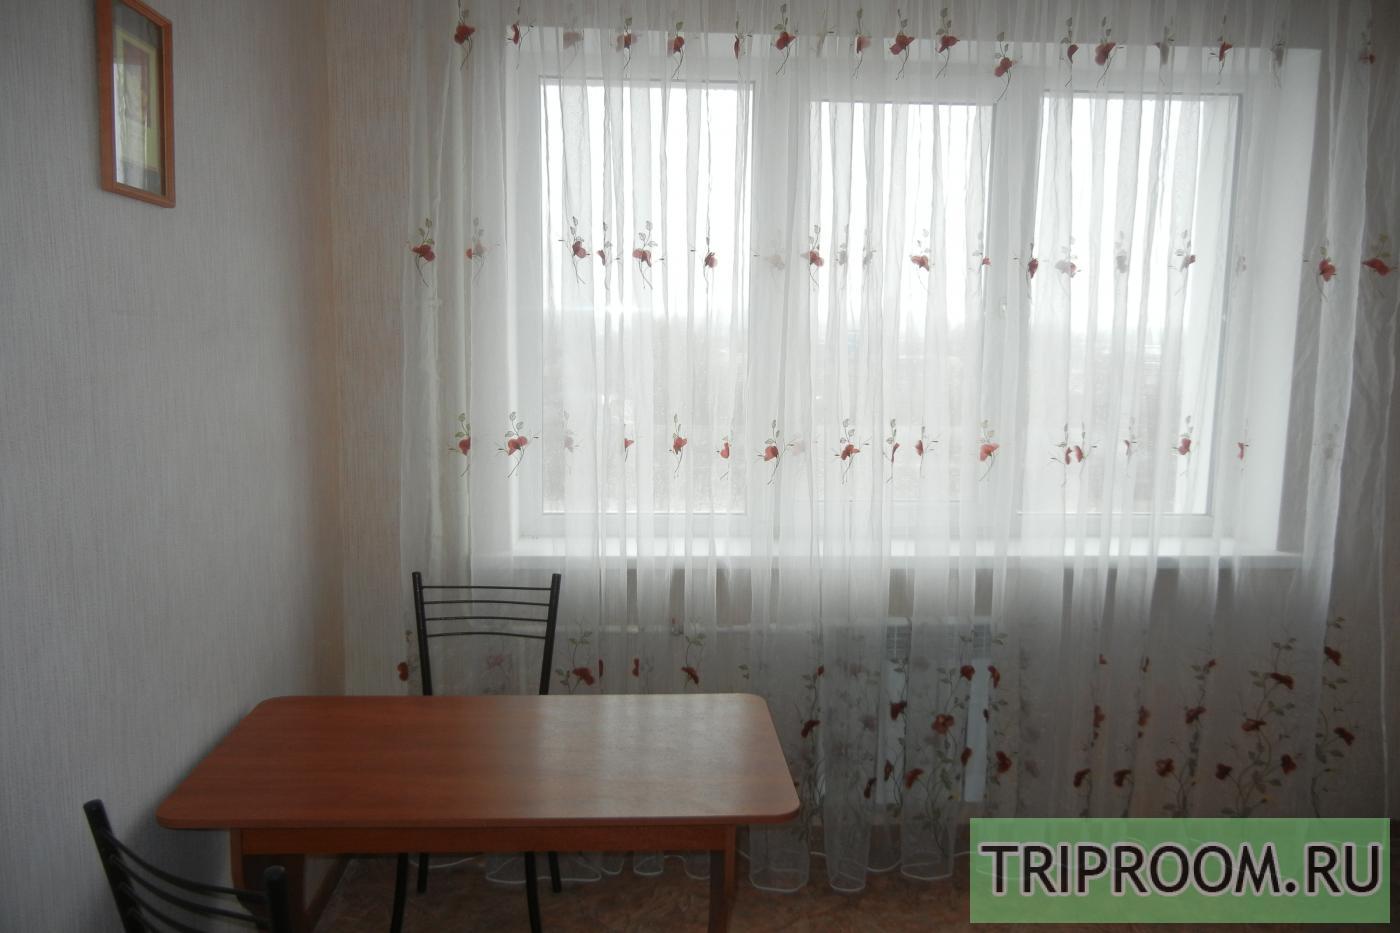 2-комнатная квартира посуточно (вариант № 13501), ул. Пеше-стрелецкая улица, фото № 10